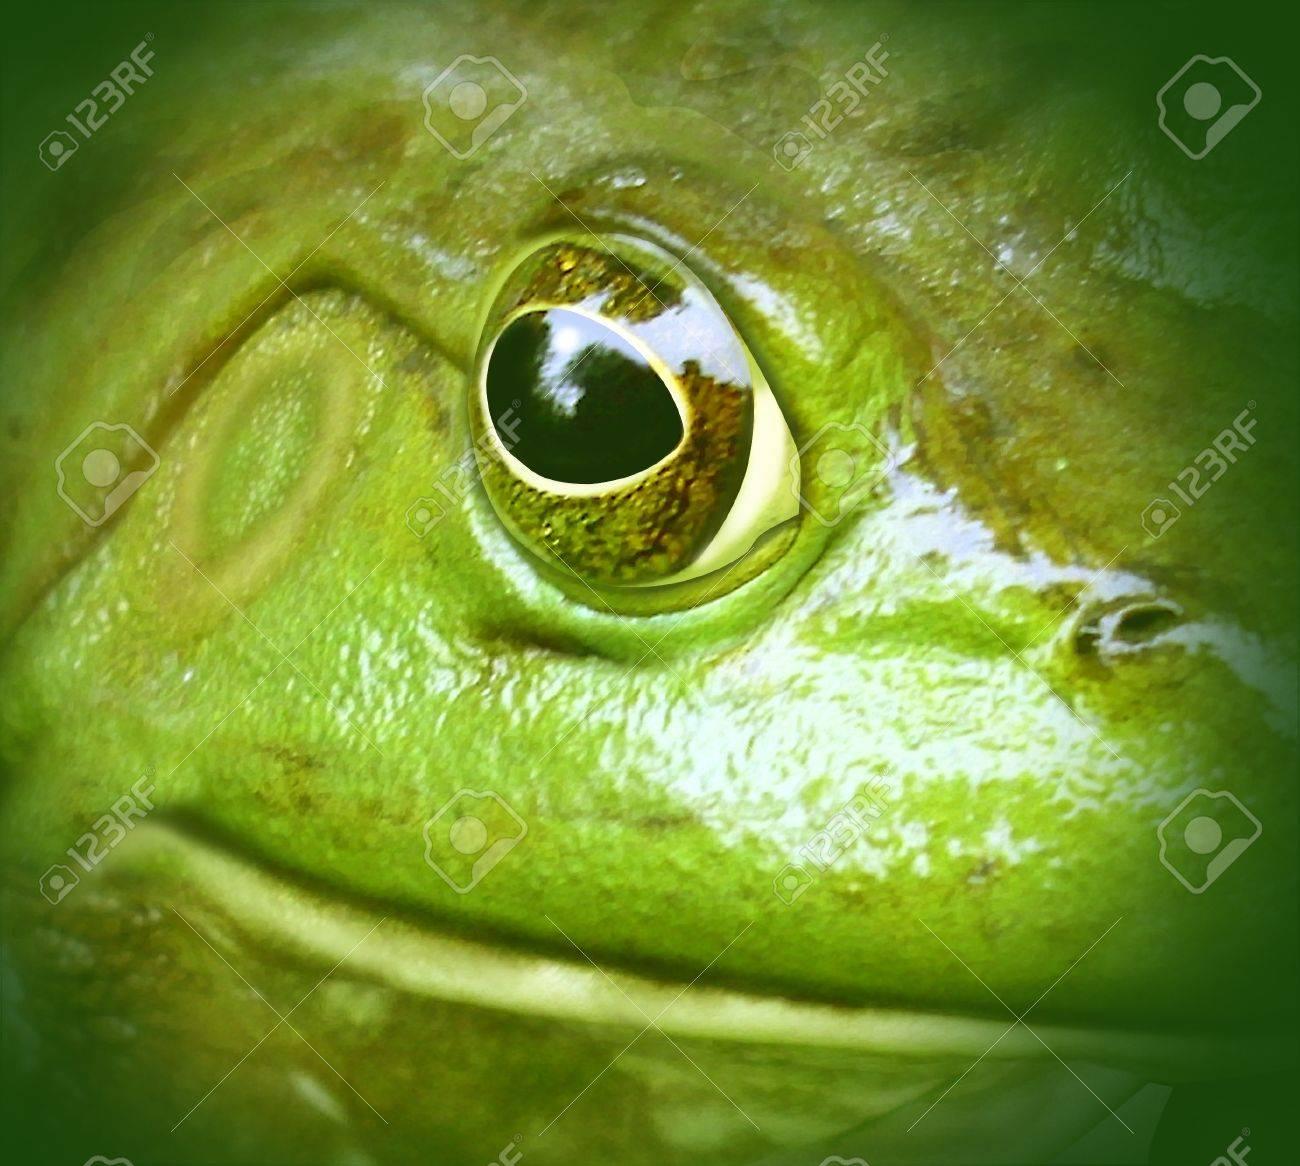 Frog green environment close up clean water nature symbol Stock Photo - 10976387